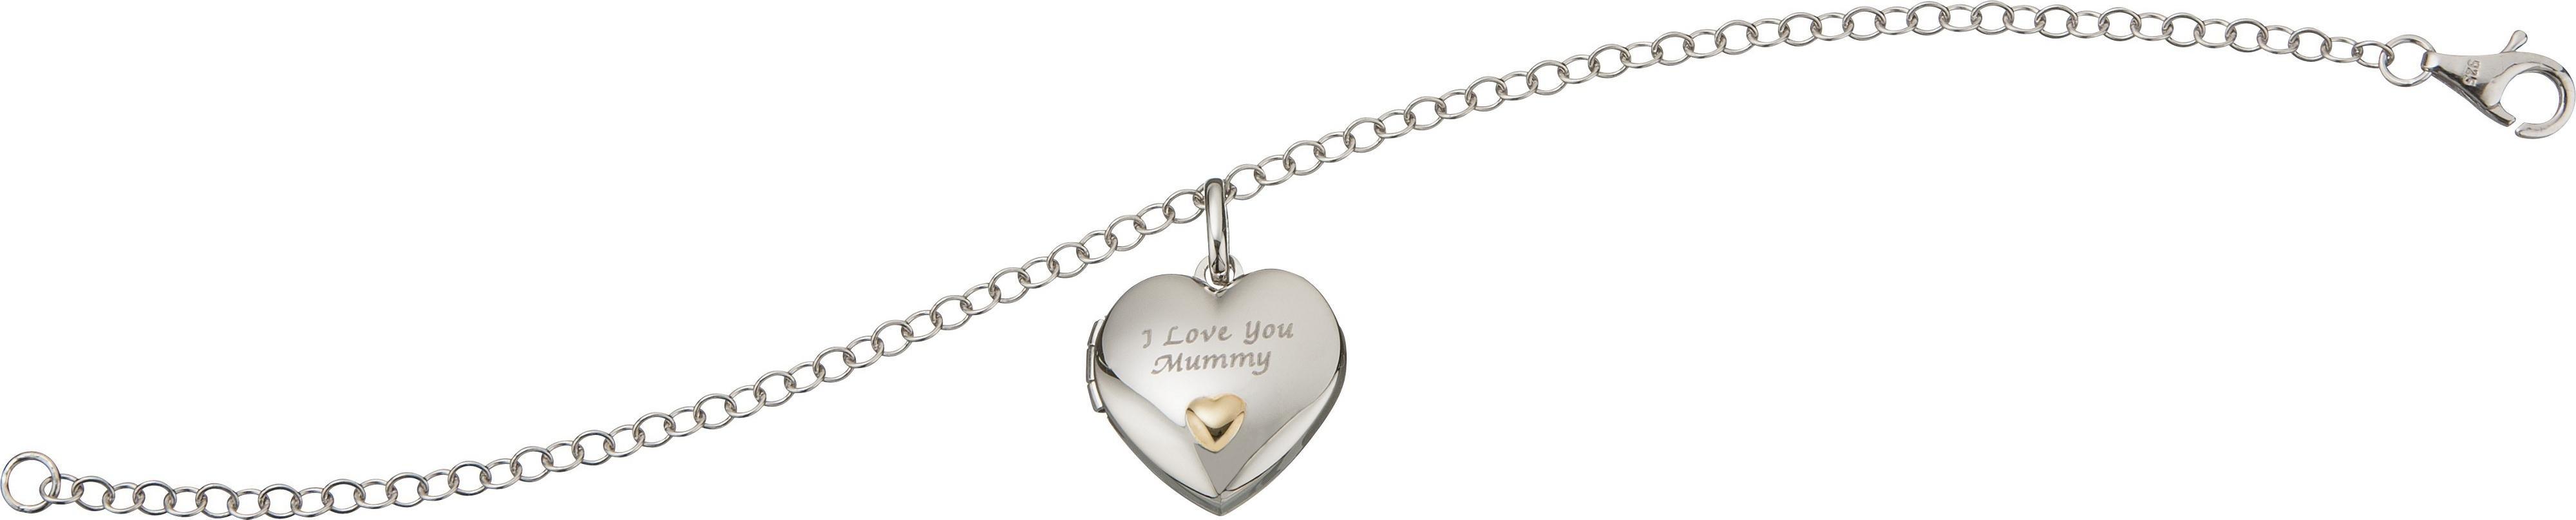 Sterling Silver - 2 Coloured 'I Love You Mummy' Heart Bracelet